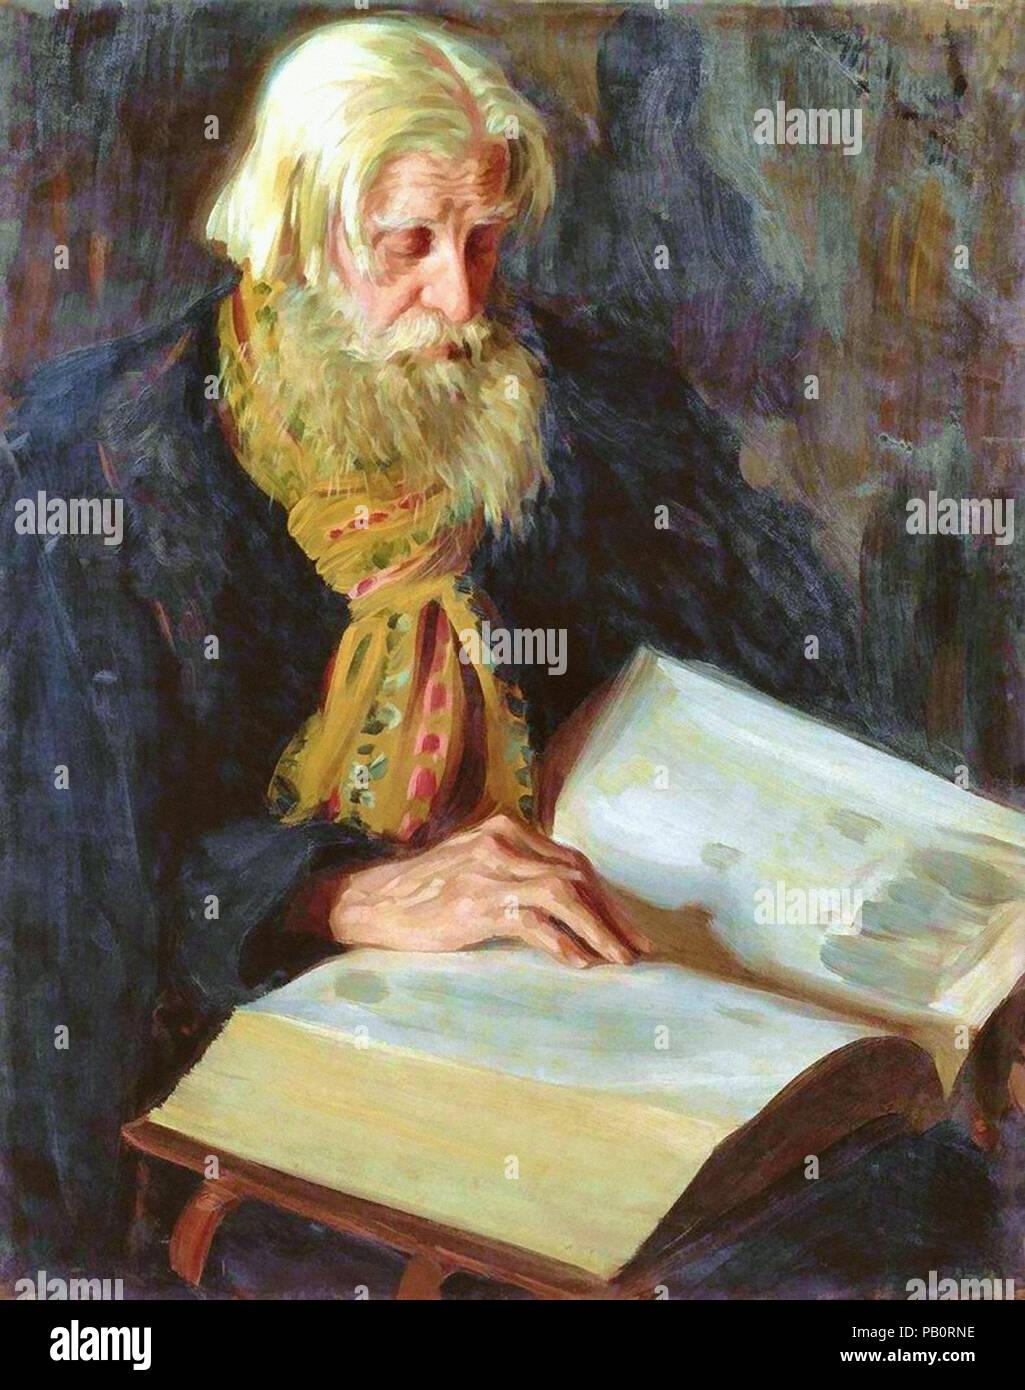 Kulikov Ivan Semionovich - un viejo Ritualista anciano de estudio Imagen De Stock